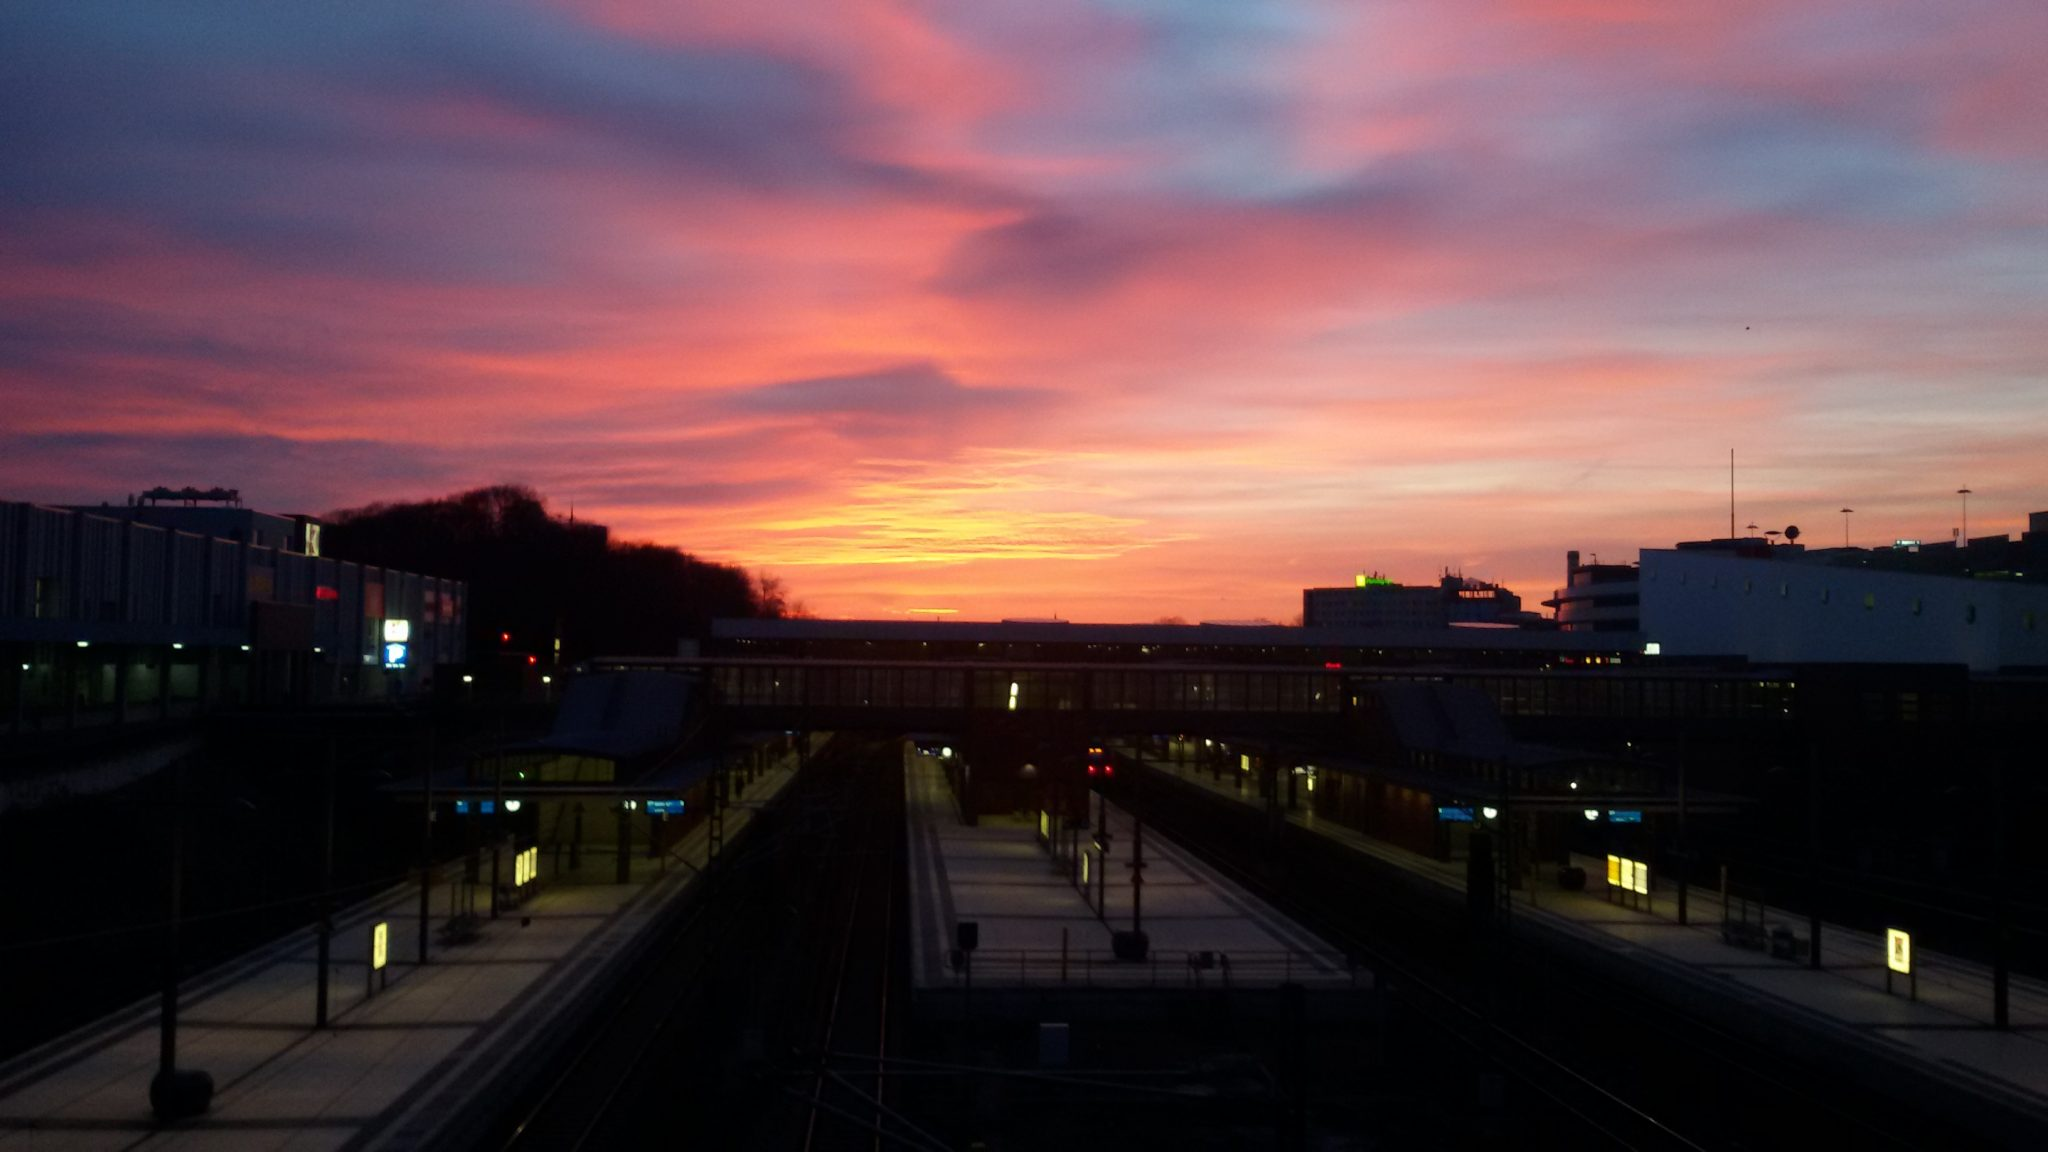 Bahnhof Gesundbrunnen Sonnenuntergang Humboldthain